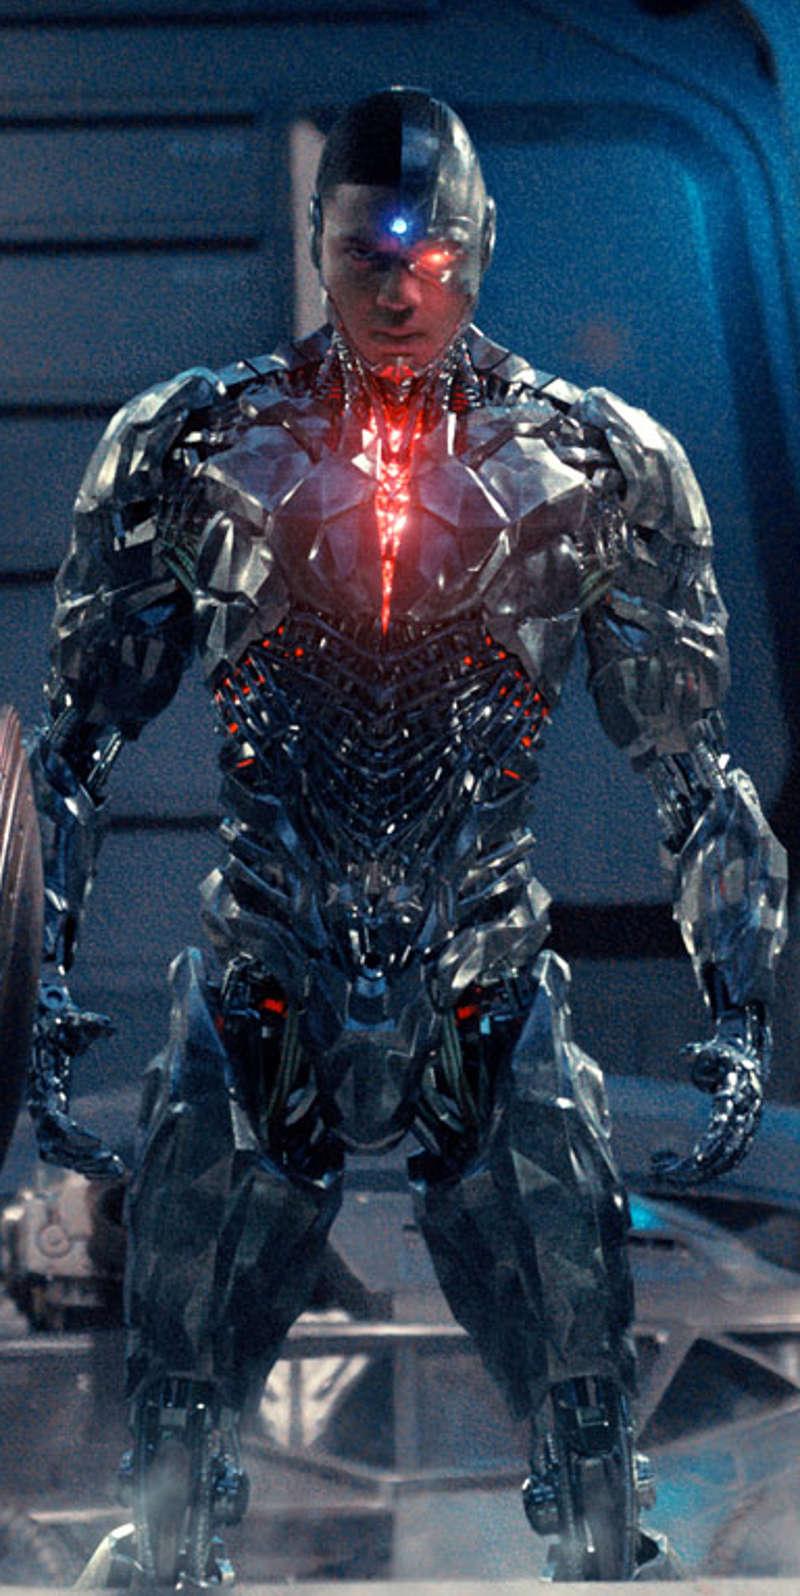 Justice League Costumes - Aquaman